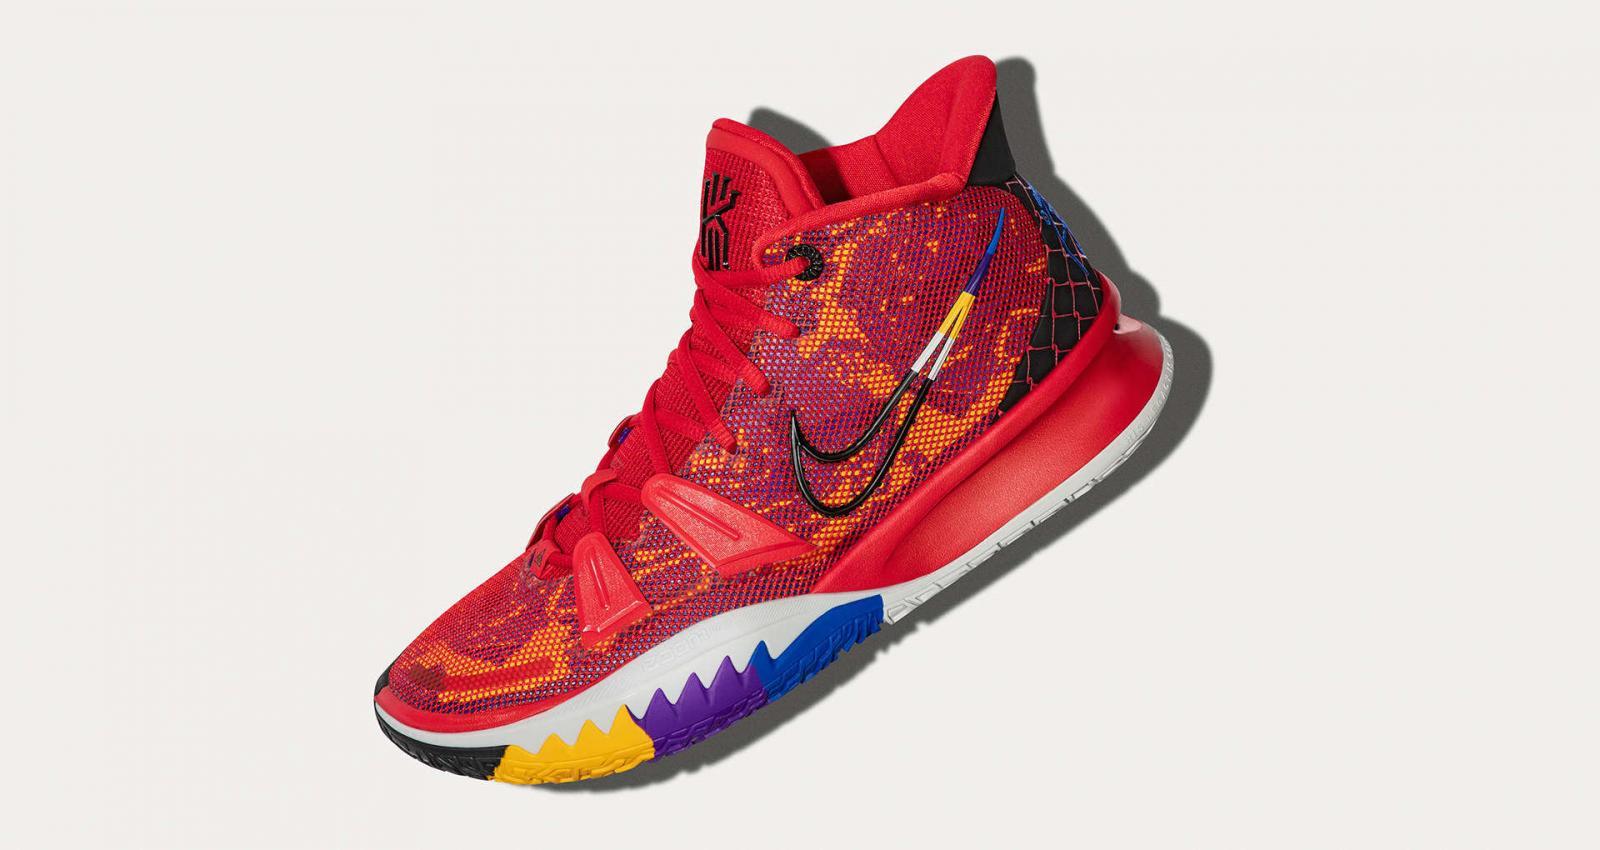 Nike Basketball将以神秘盲盒形式发售四款限量配色KYRIE 7